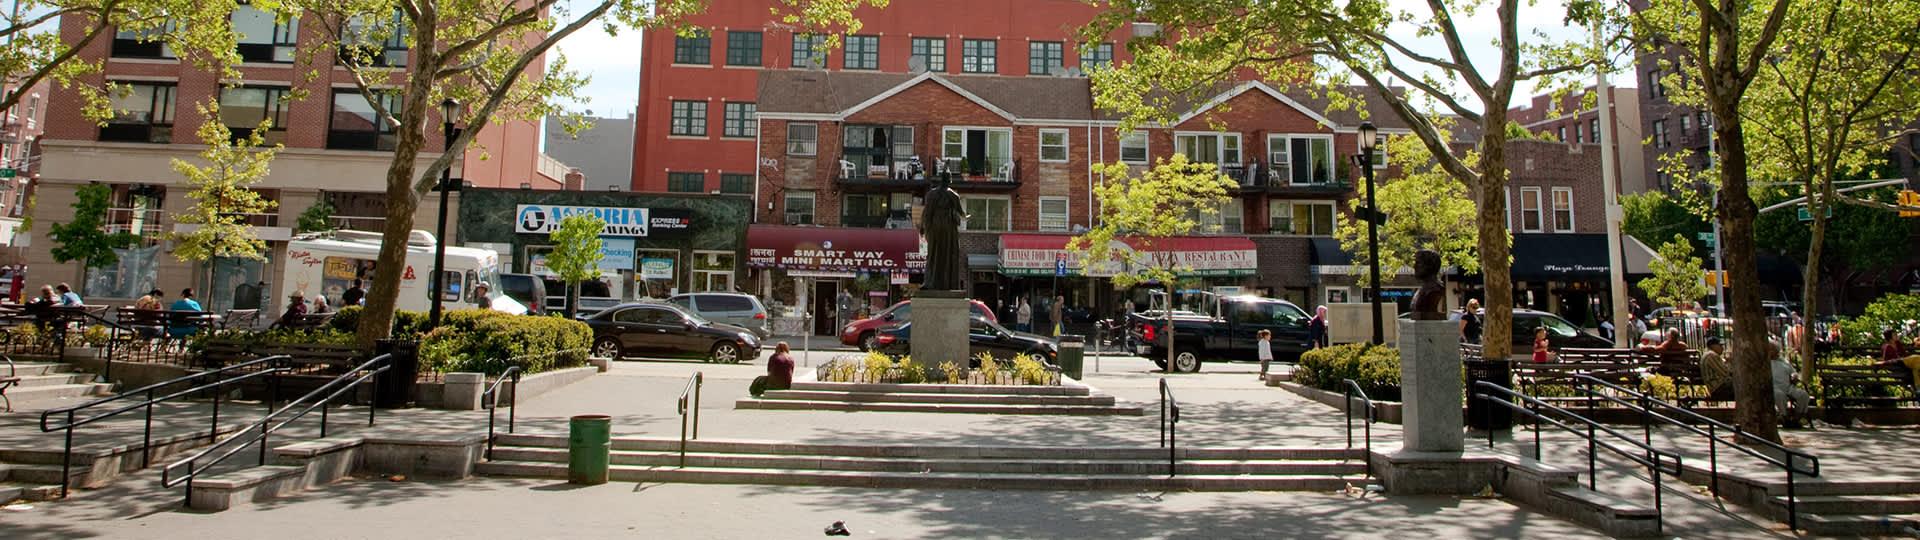 Parque de Atenas Square, Astoria, Queens